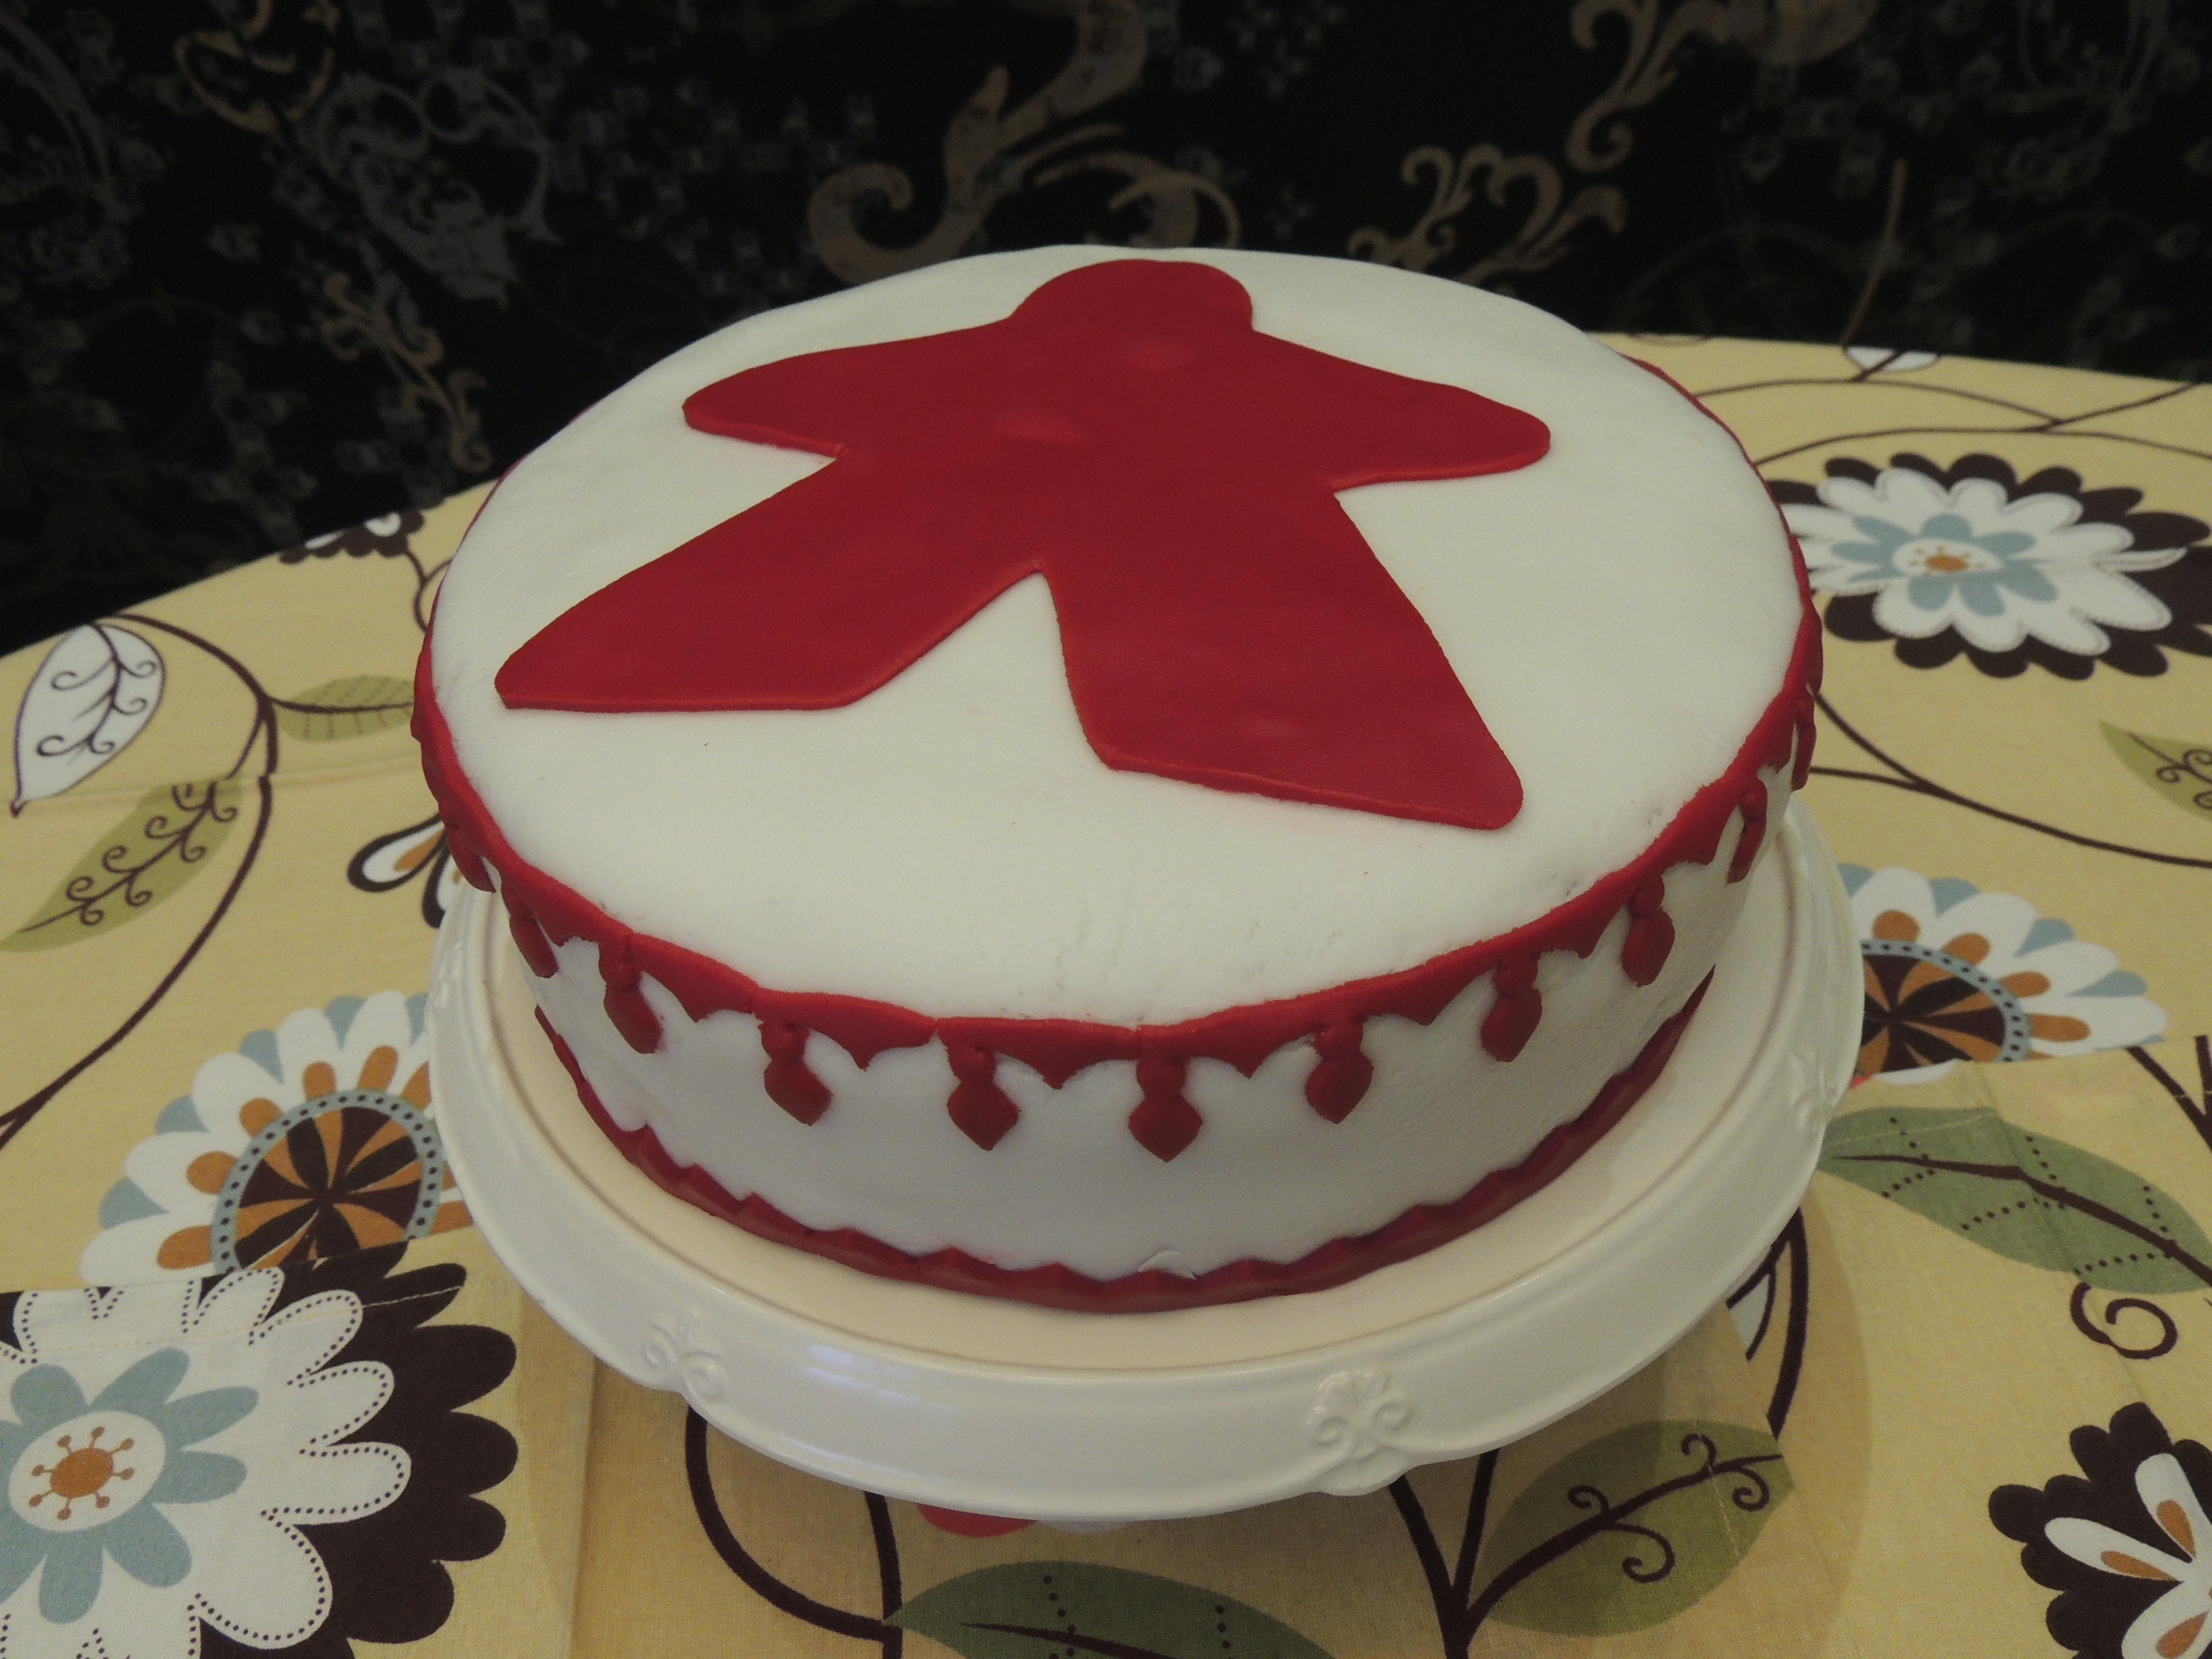 2007 Dayi Hou Pu Bing Ripe Pu Er, 500g/cake - Tealux Store